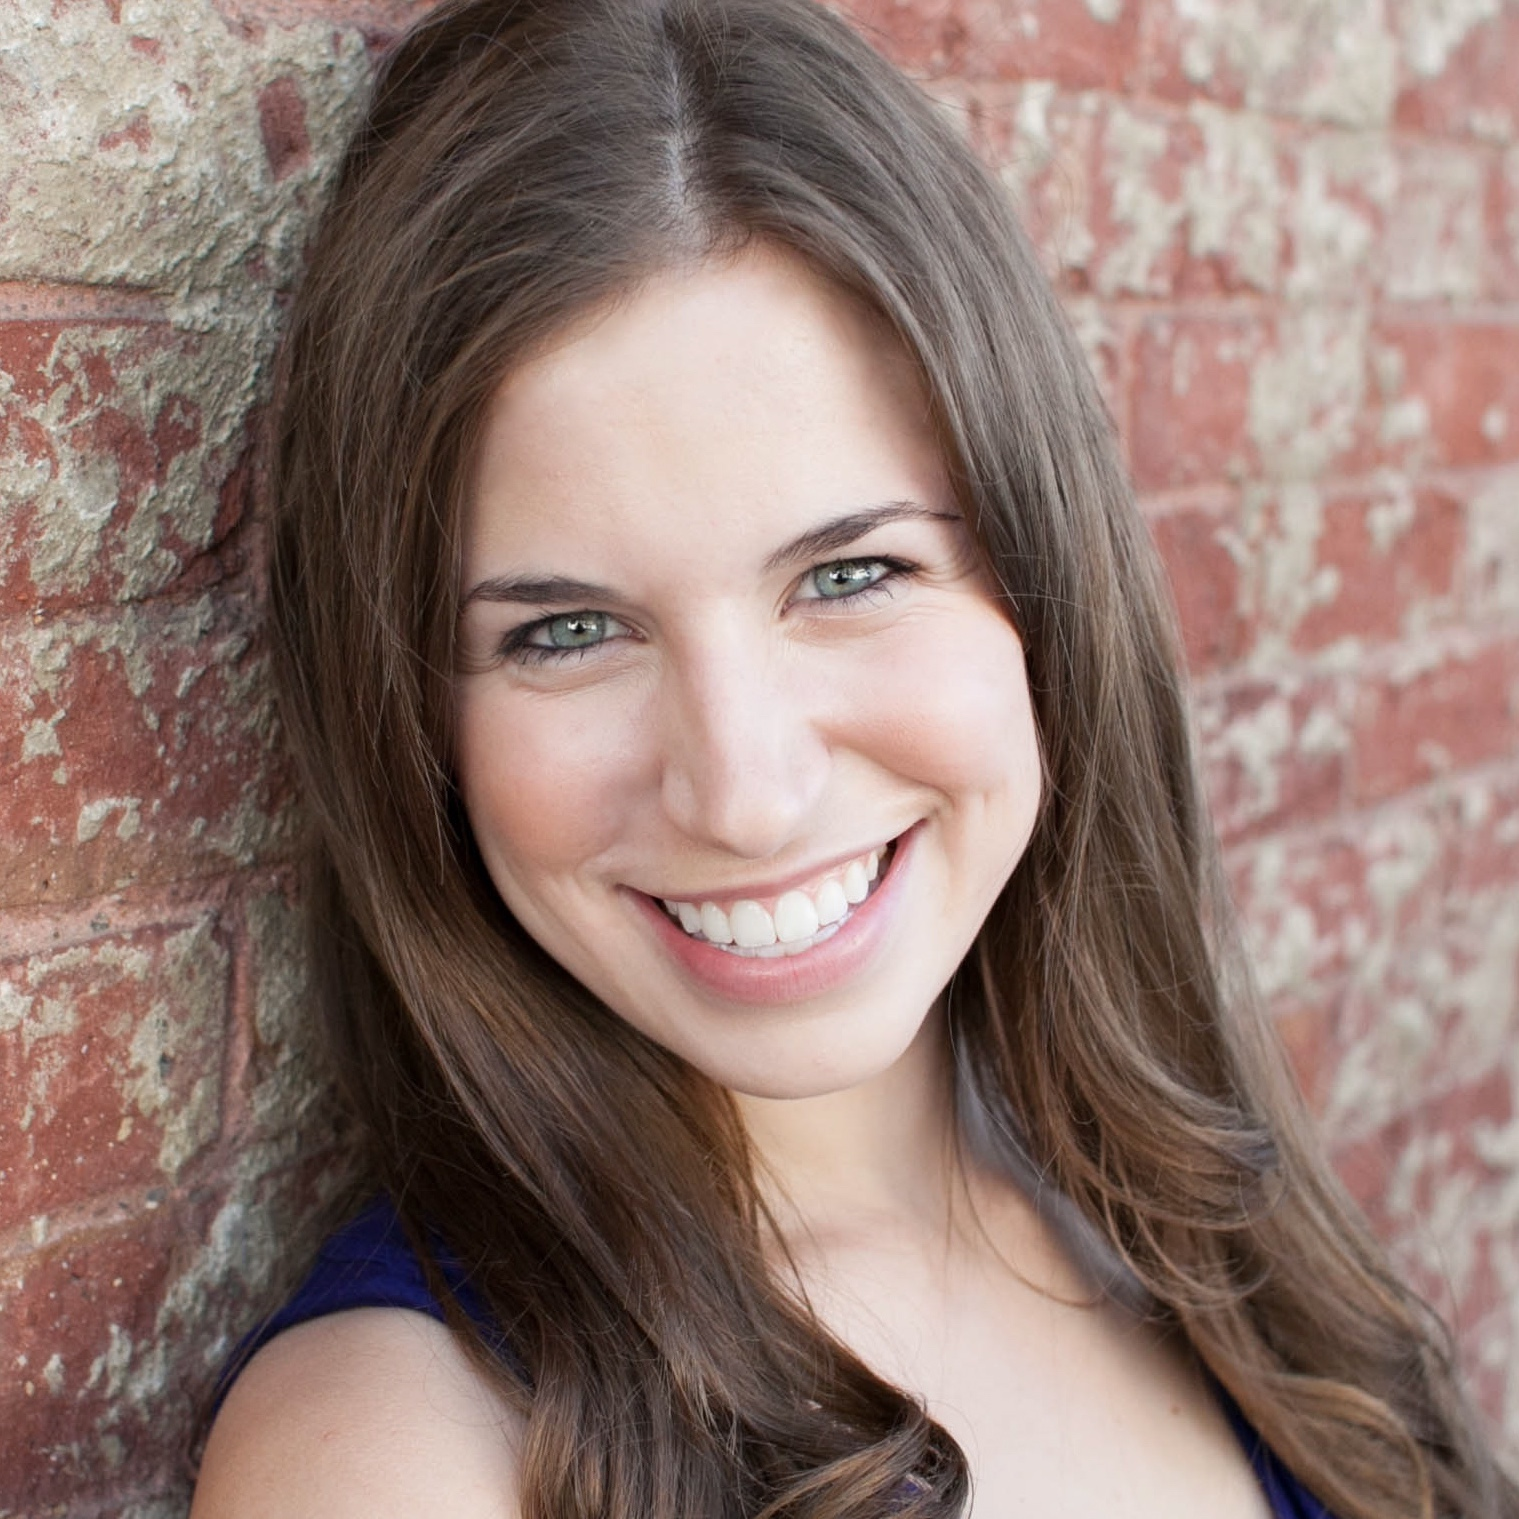 Lauren+Meyer+Headshot.jpg